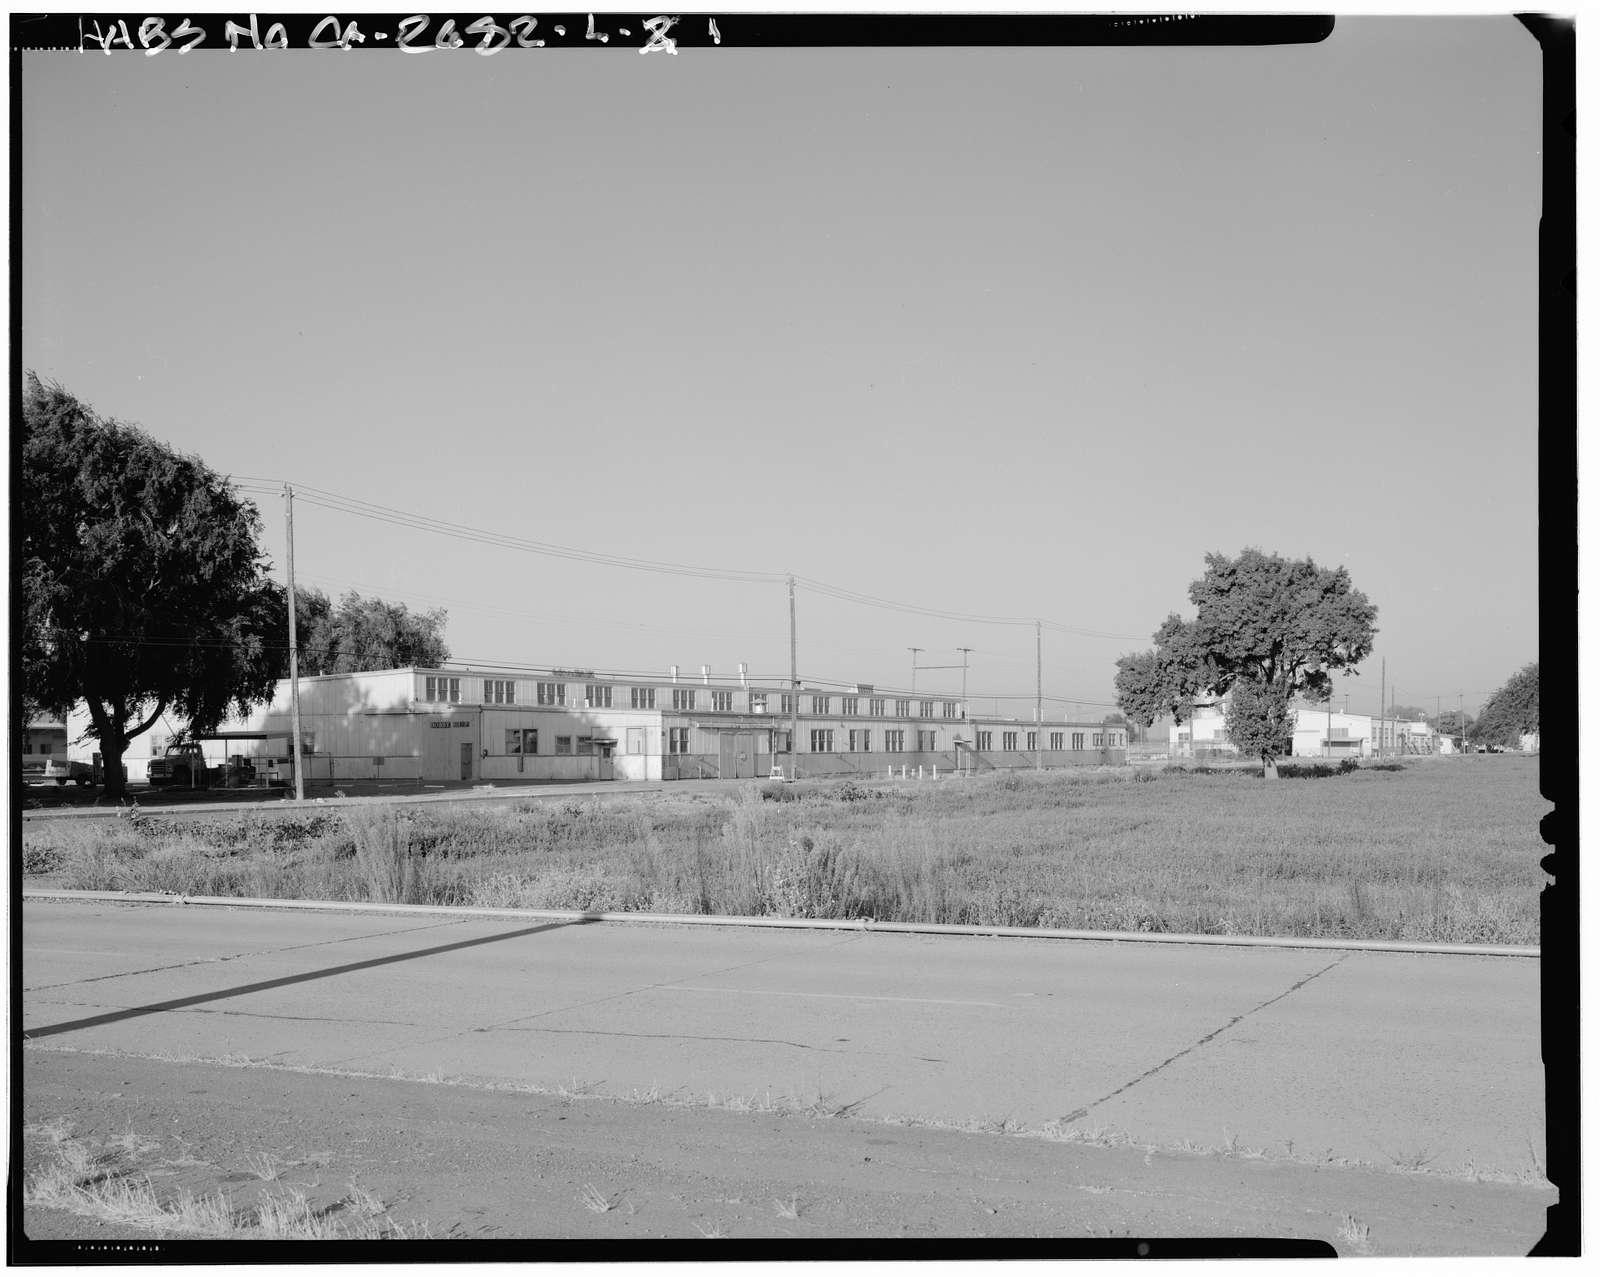 Naval Supply Annex Stockton, Box Factory, Between Fyffe & Davis Avenues & Daly & Maas Drives, Stockton, San Joaquin County, CA